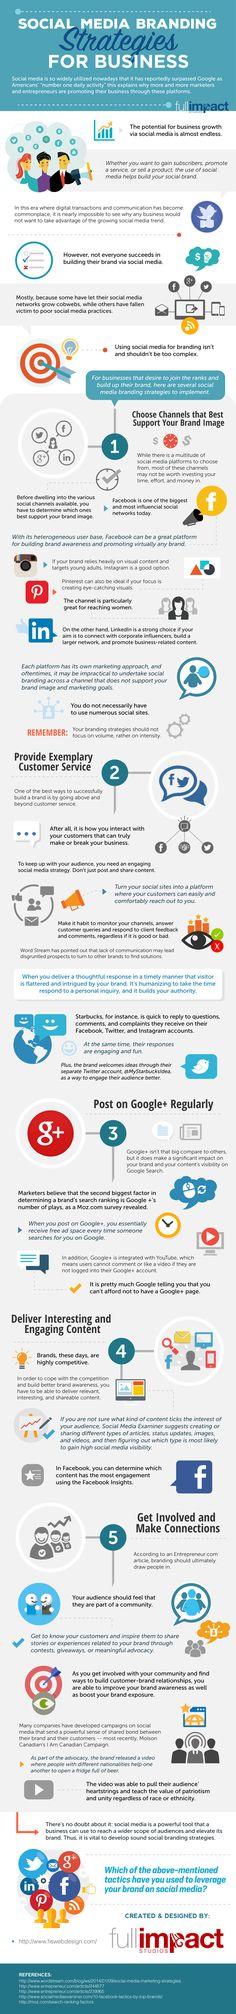 5 Social Media Branding Strategies for Business [Infographic] | Social Media Today